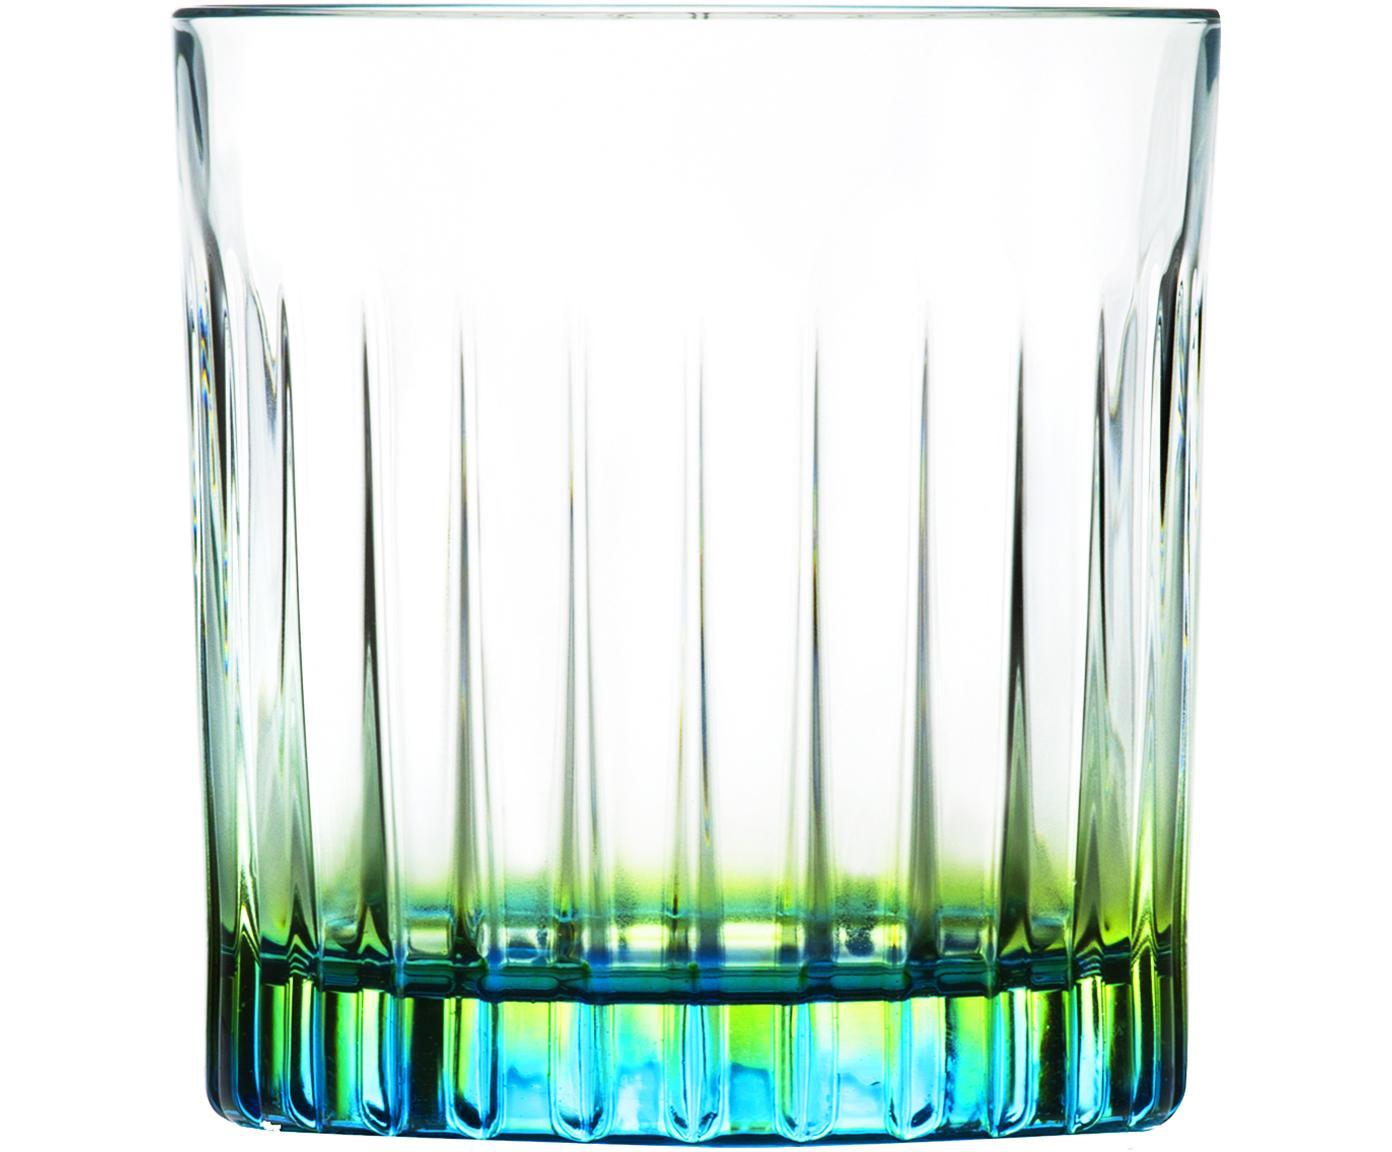 Kristallen tumblers Gipsy, 6 stuks, Luxion-kristalglas, Transparant, groengeel, turquoise, Ø 8 cm x H 9 cm